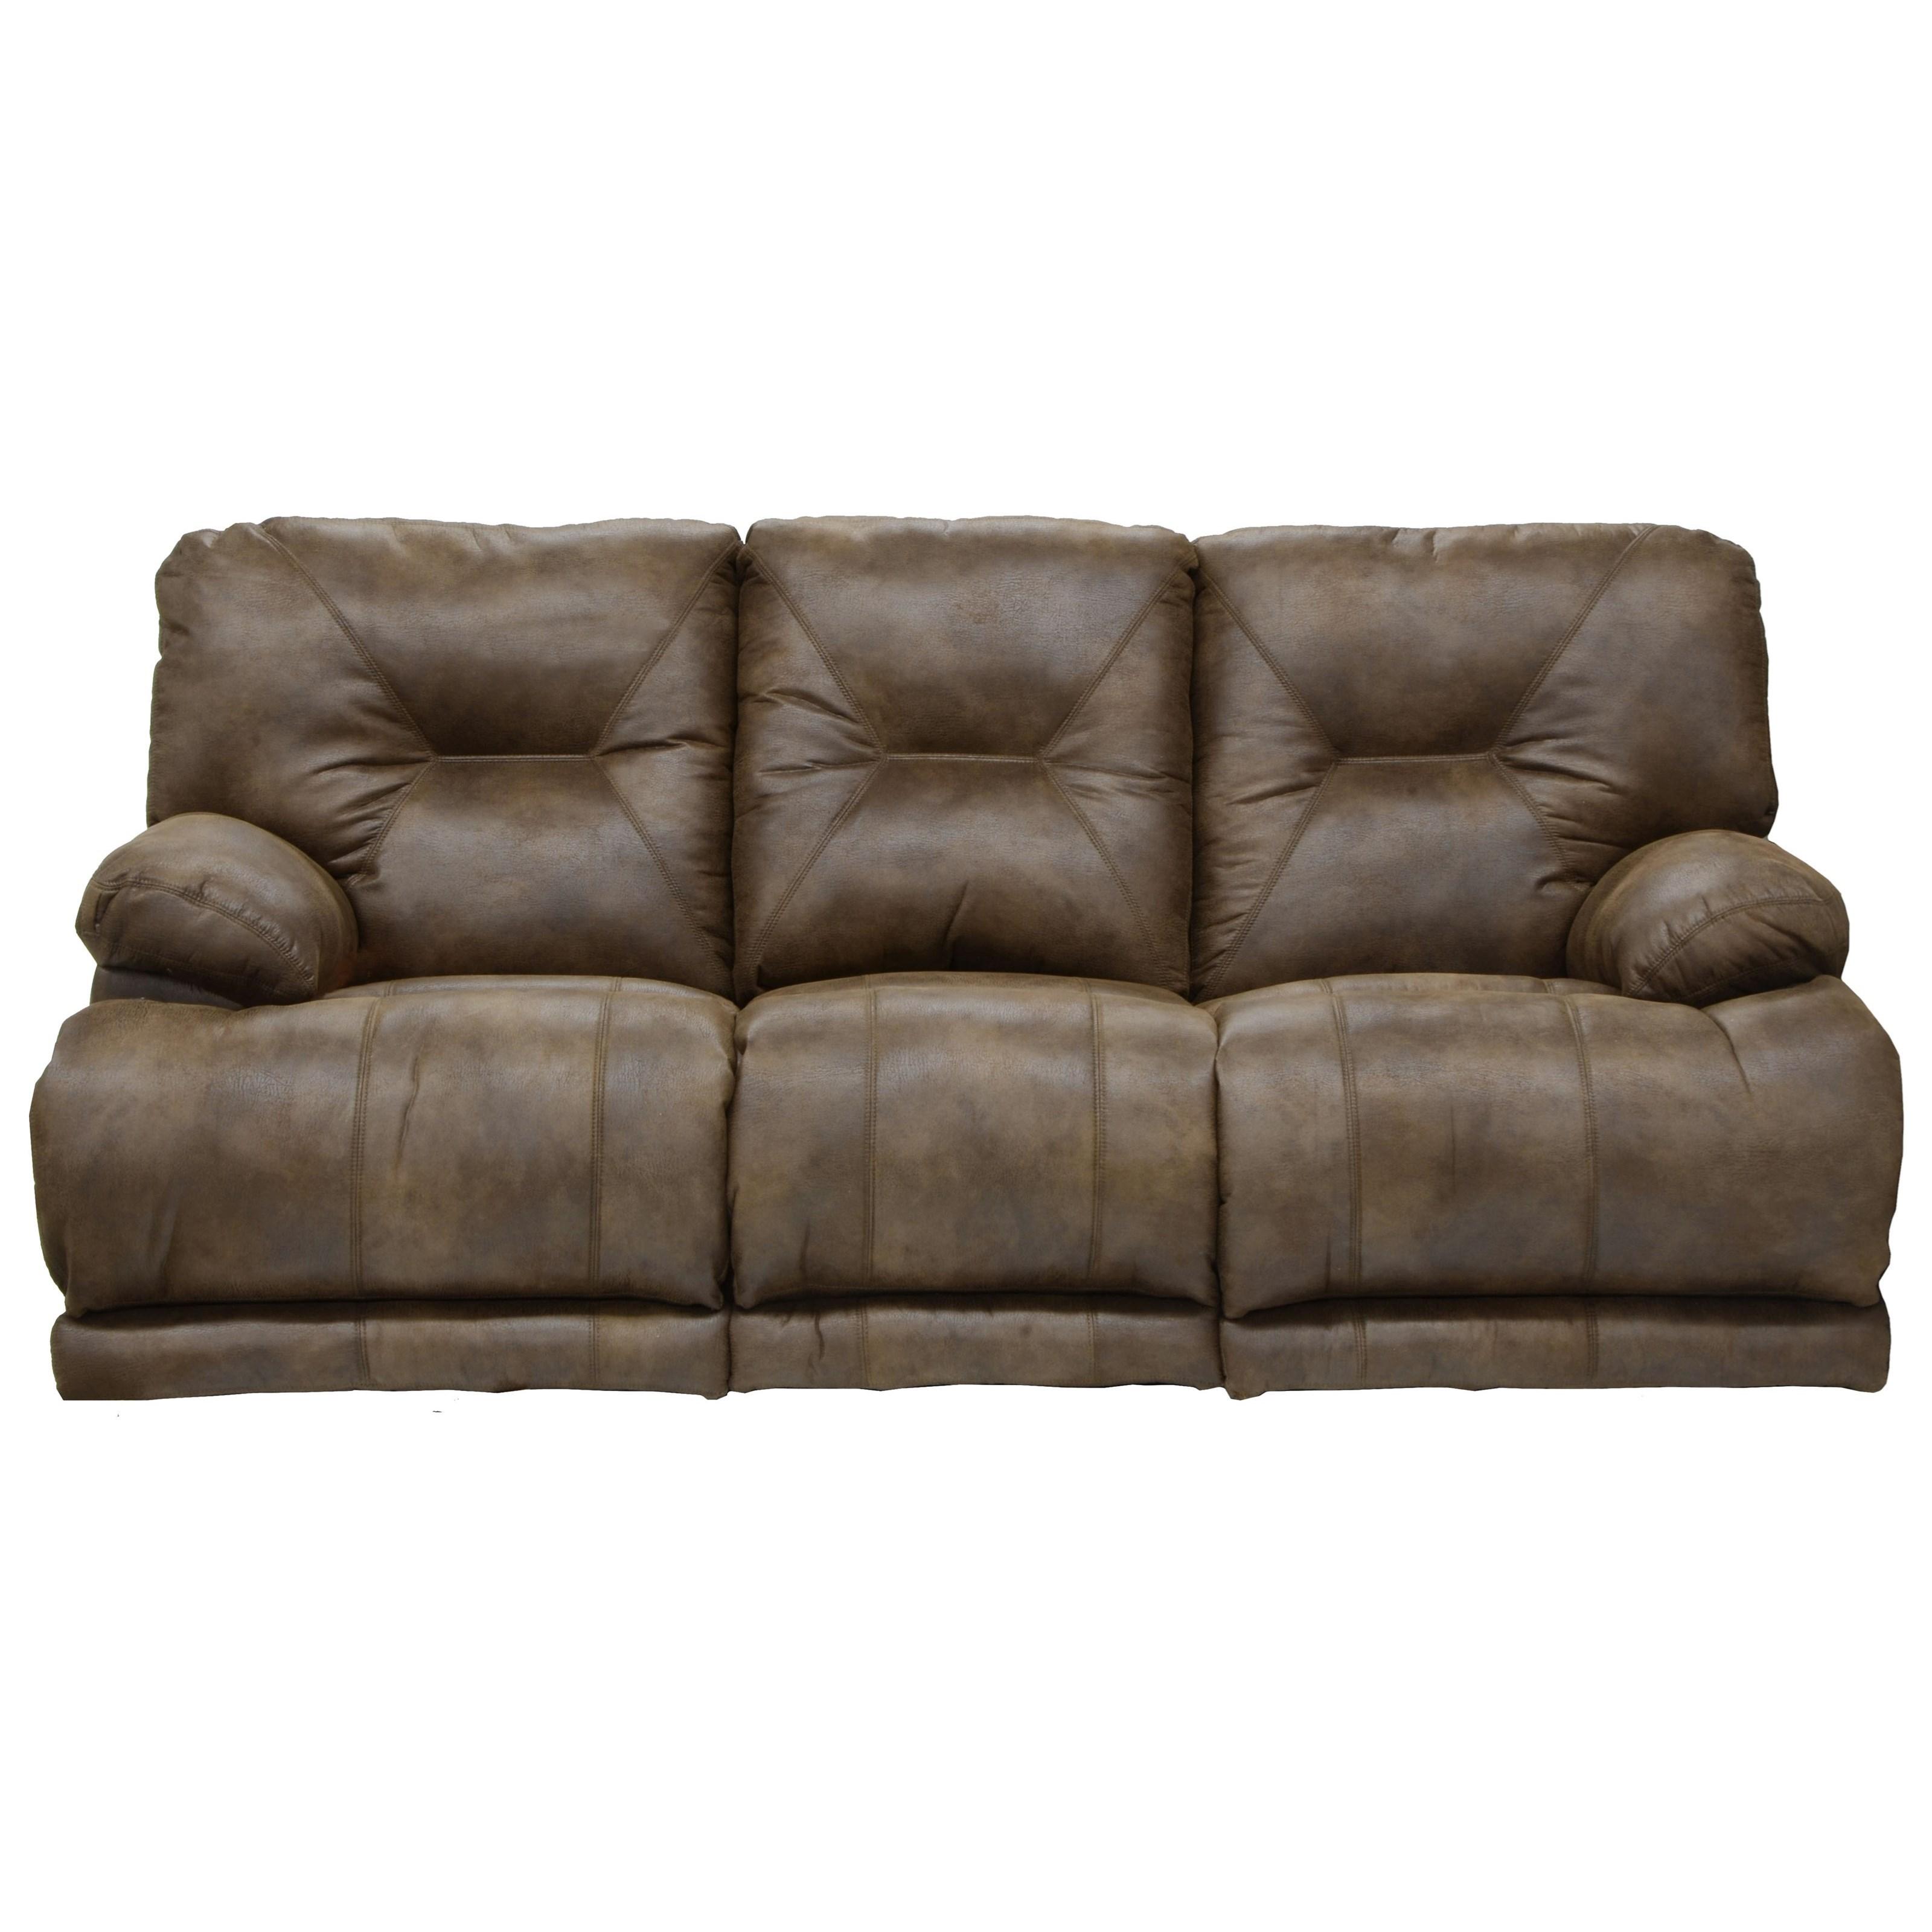 catnapper sofa bed lipat surabaya voyager 3 seat quotlay flat quot reclining